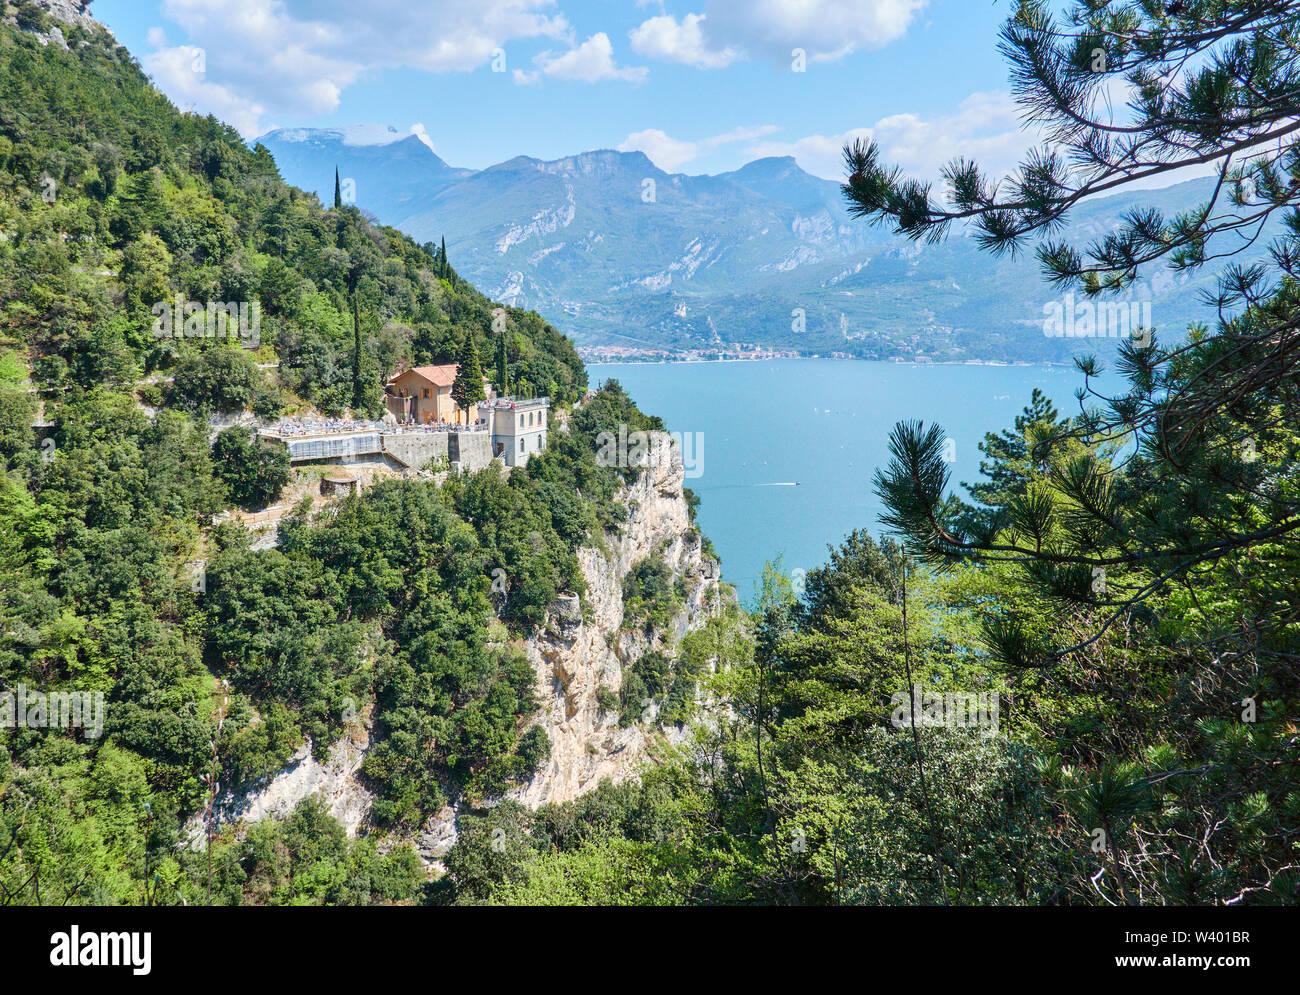 Bike road up to Pregasina  with restaurant and bar  Ponalealto, Ristorante Ponale Alto Belvedere at Lago di Garda, Lake Garda in Torbole - Nago, Riva, - Stock Image